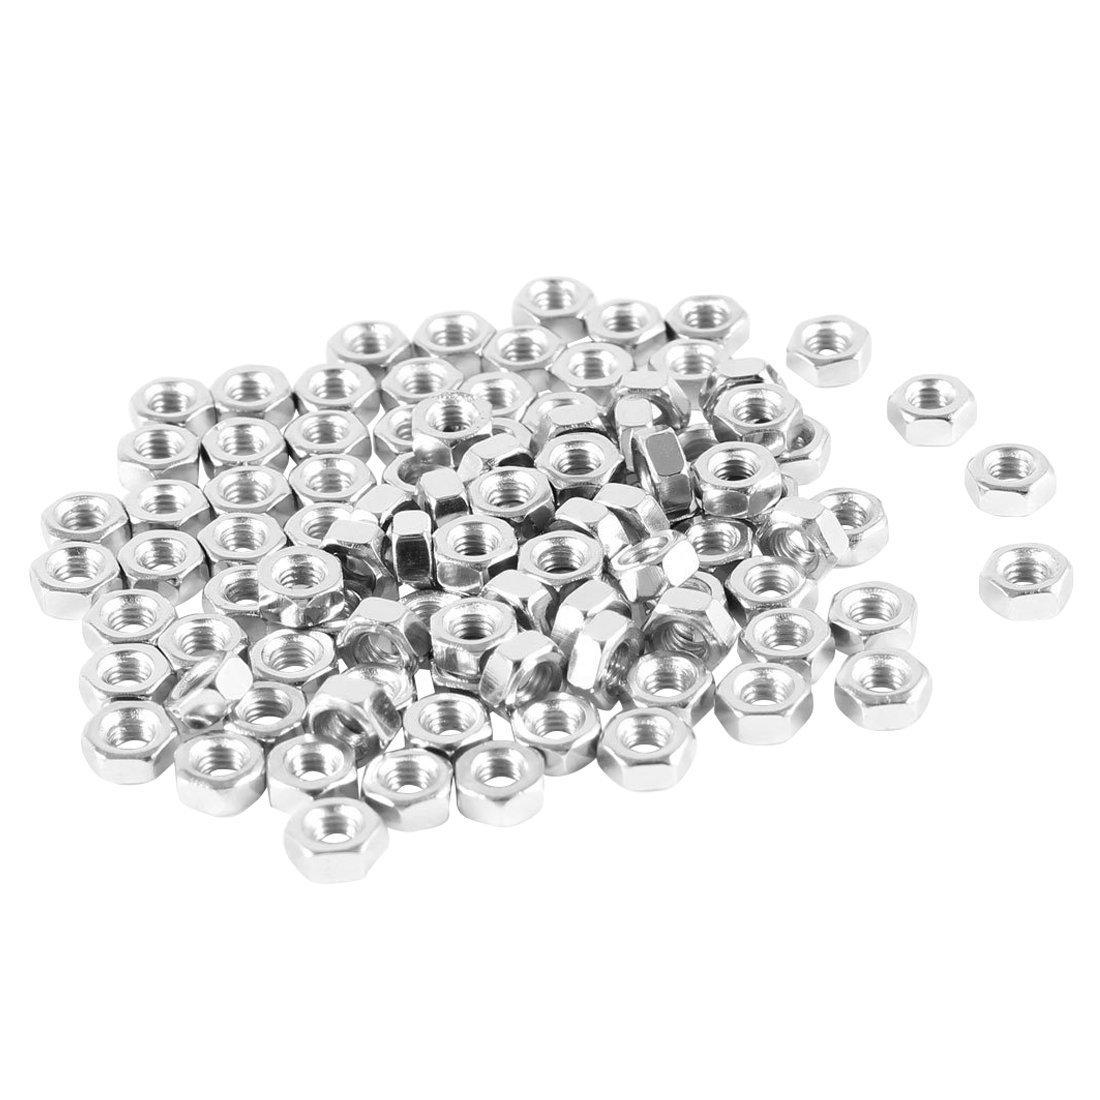 100Pcs M3 Ecrou femelle 3mm Ecrou hexagonal Ecrou argente TOOGOO Ecrou hexagonal R